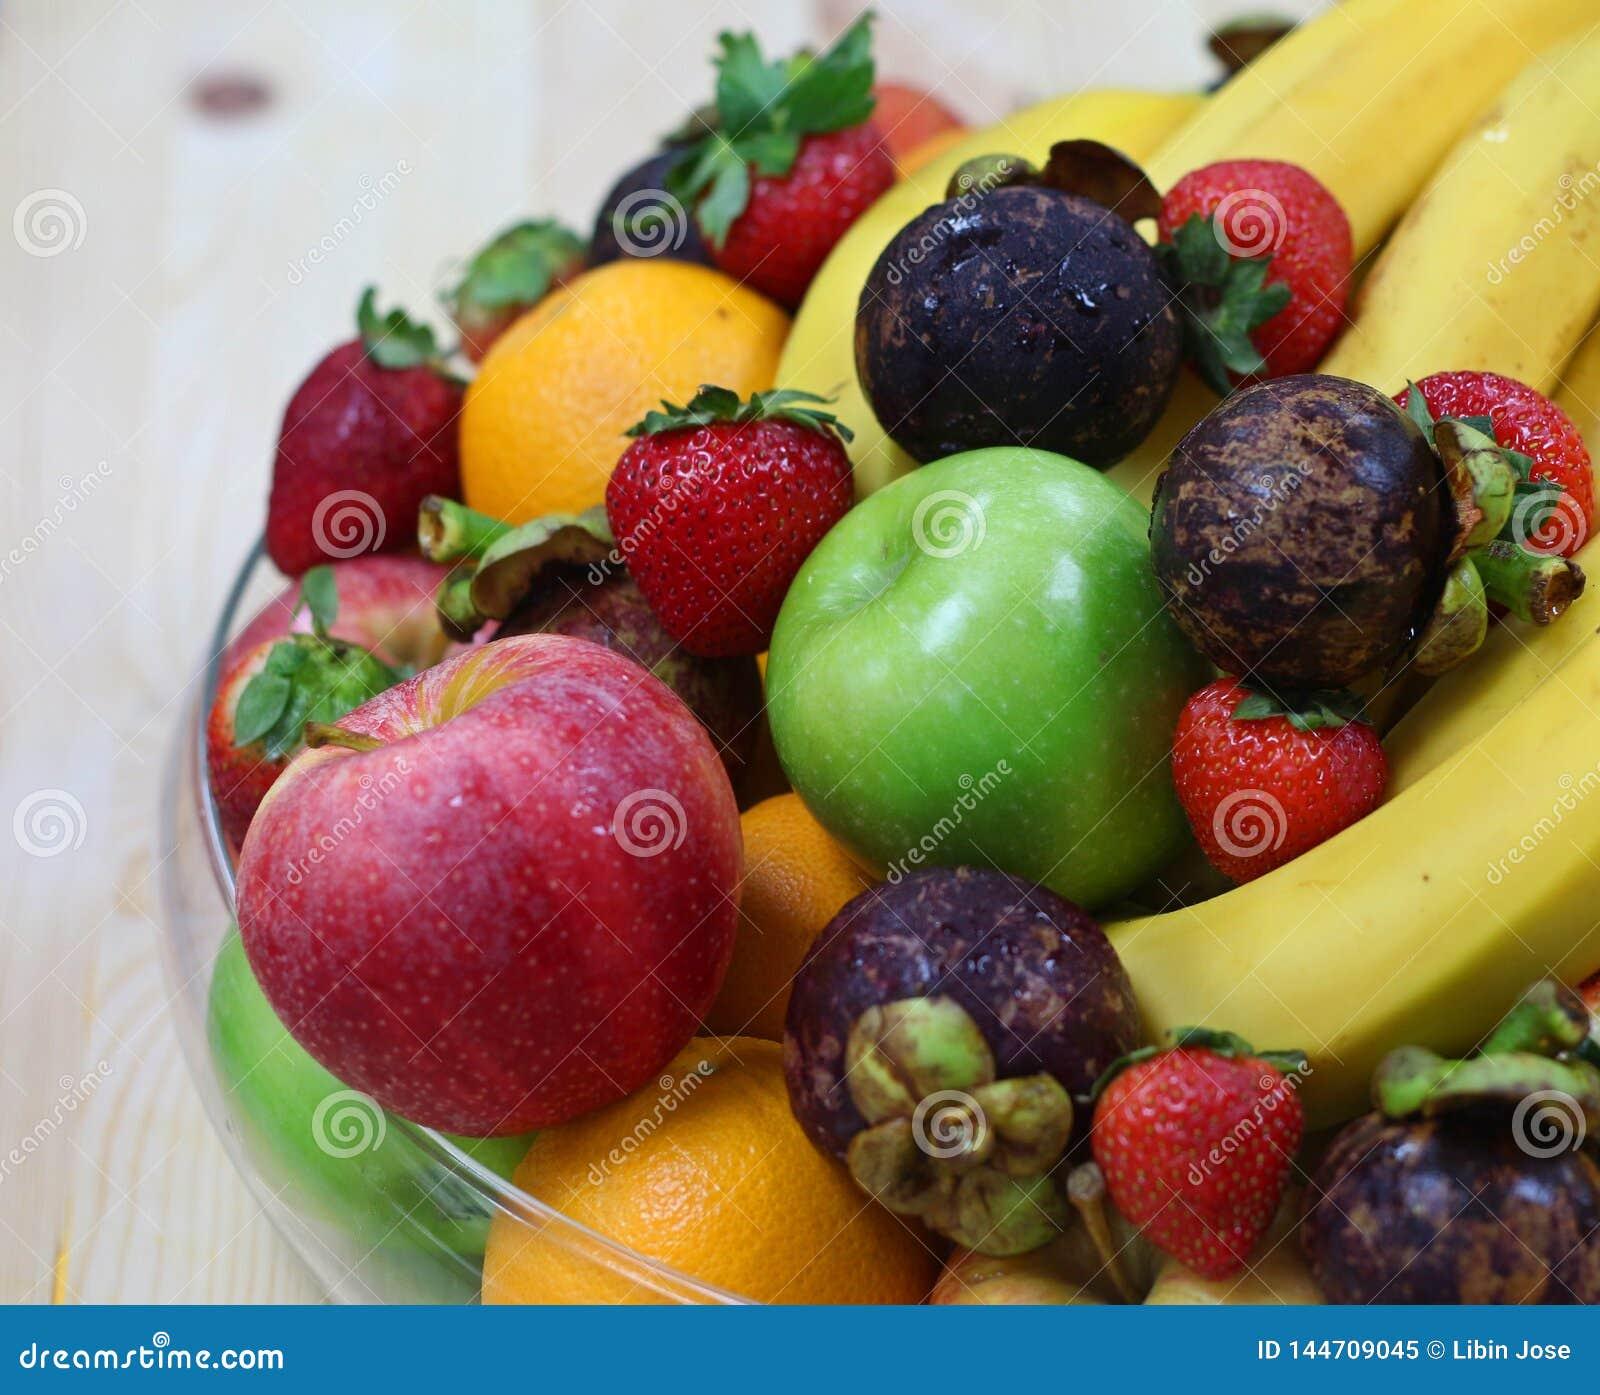 Tropical fresh fruits